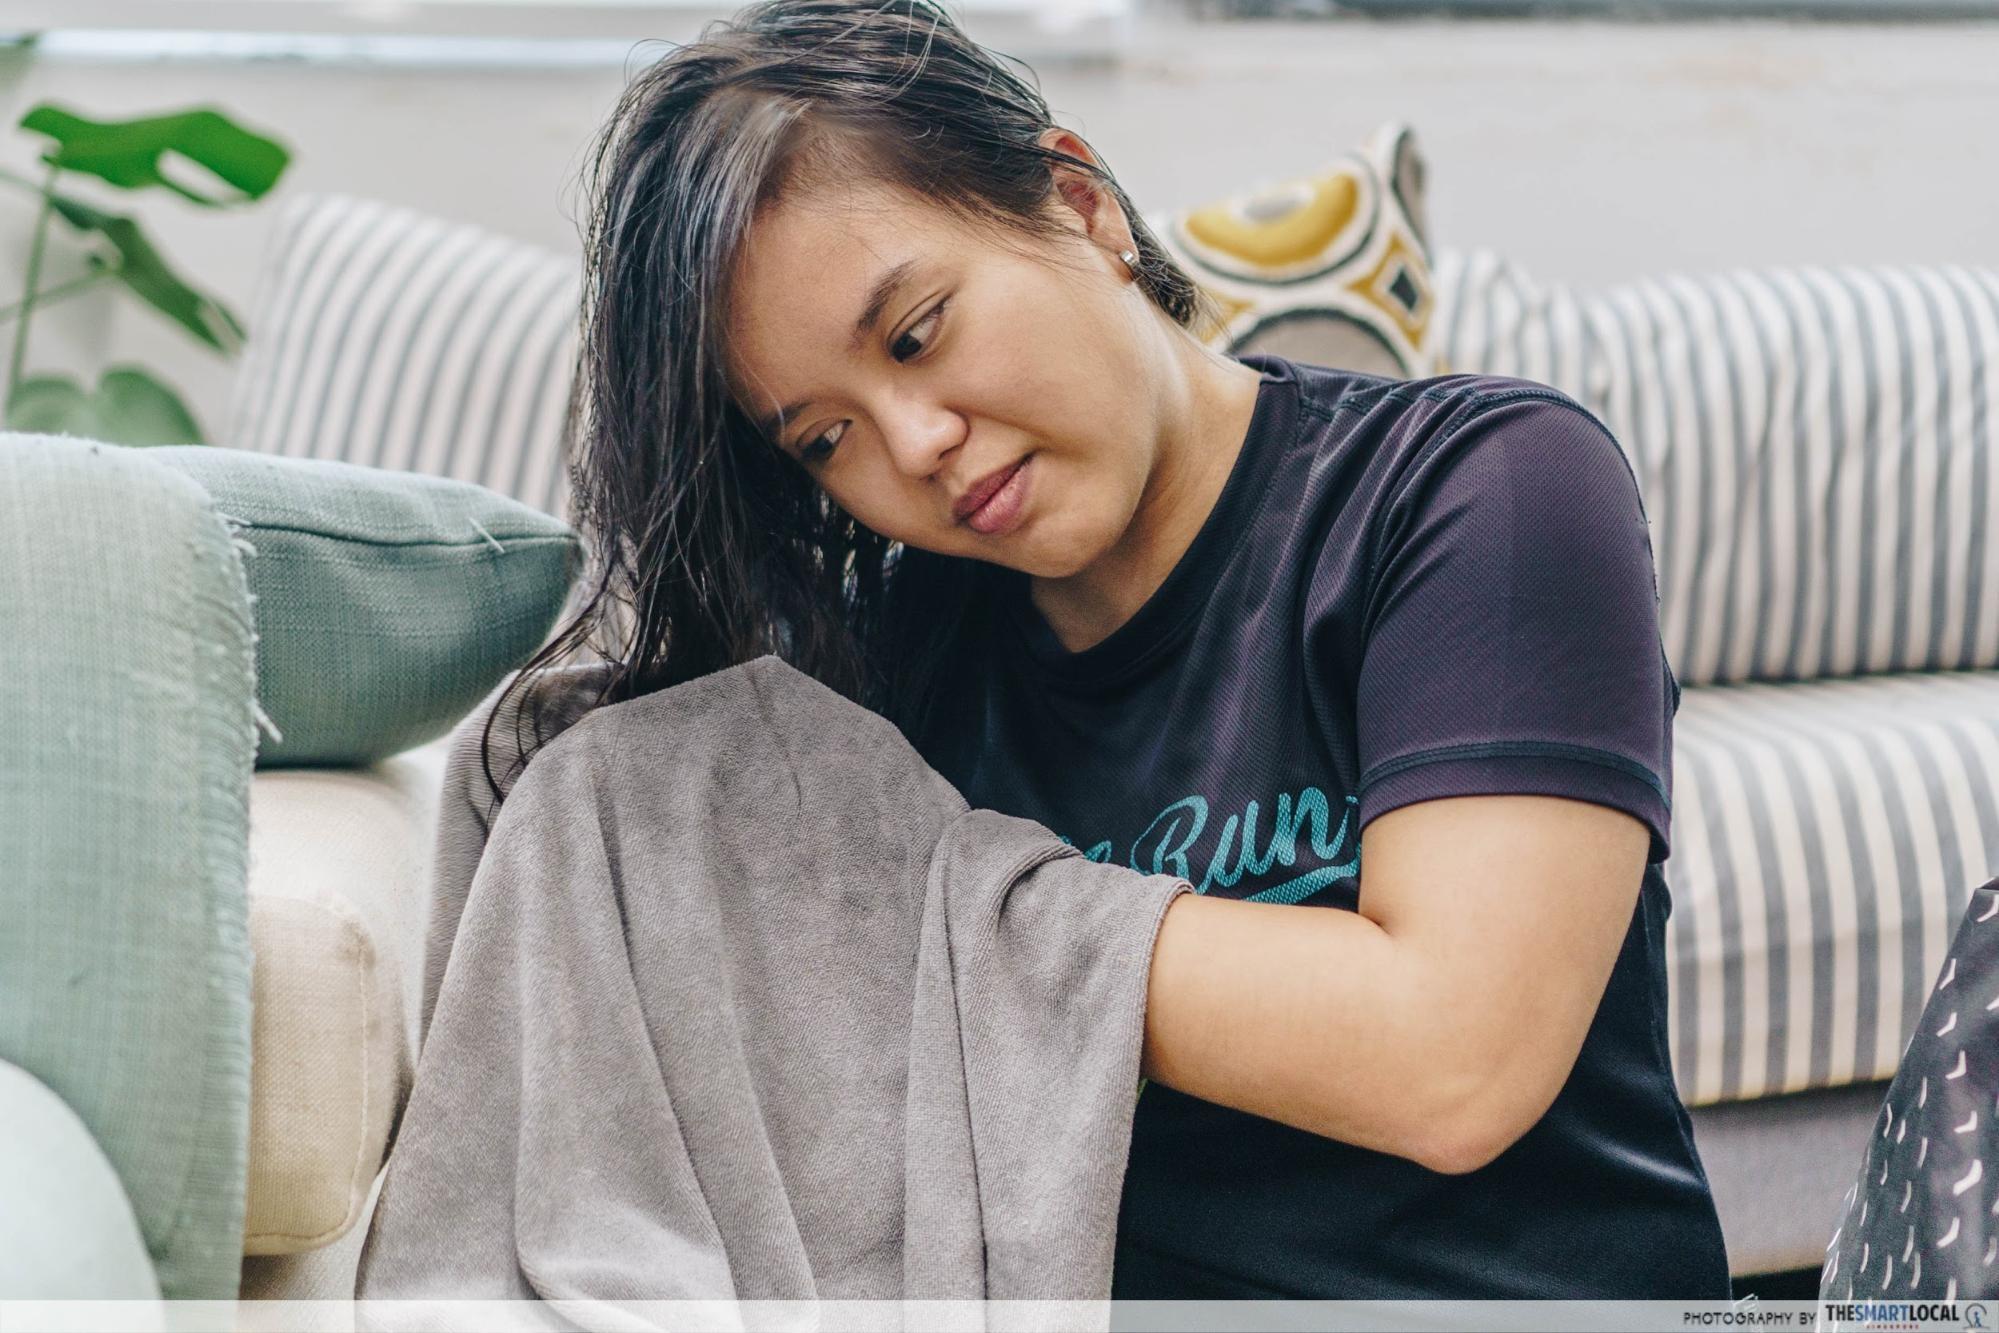 Habits for Hair Loss - Towel